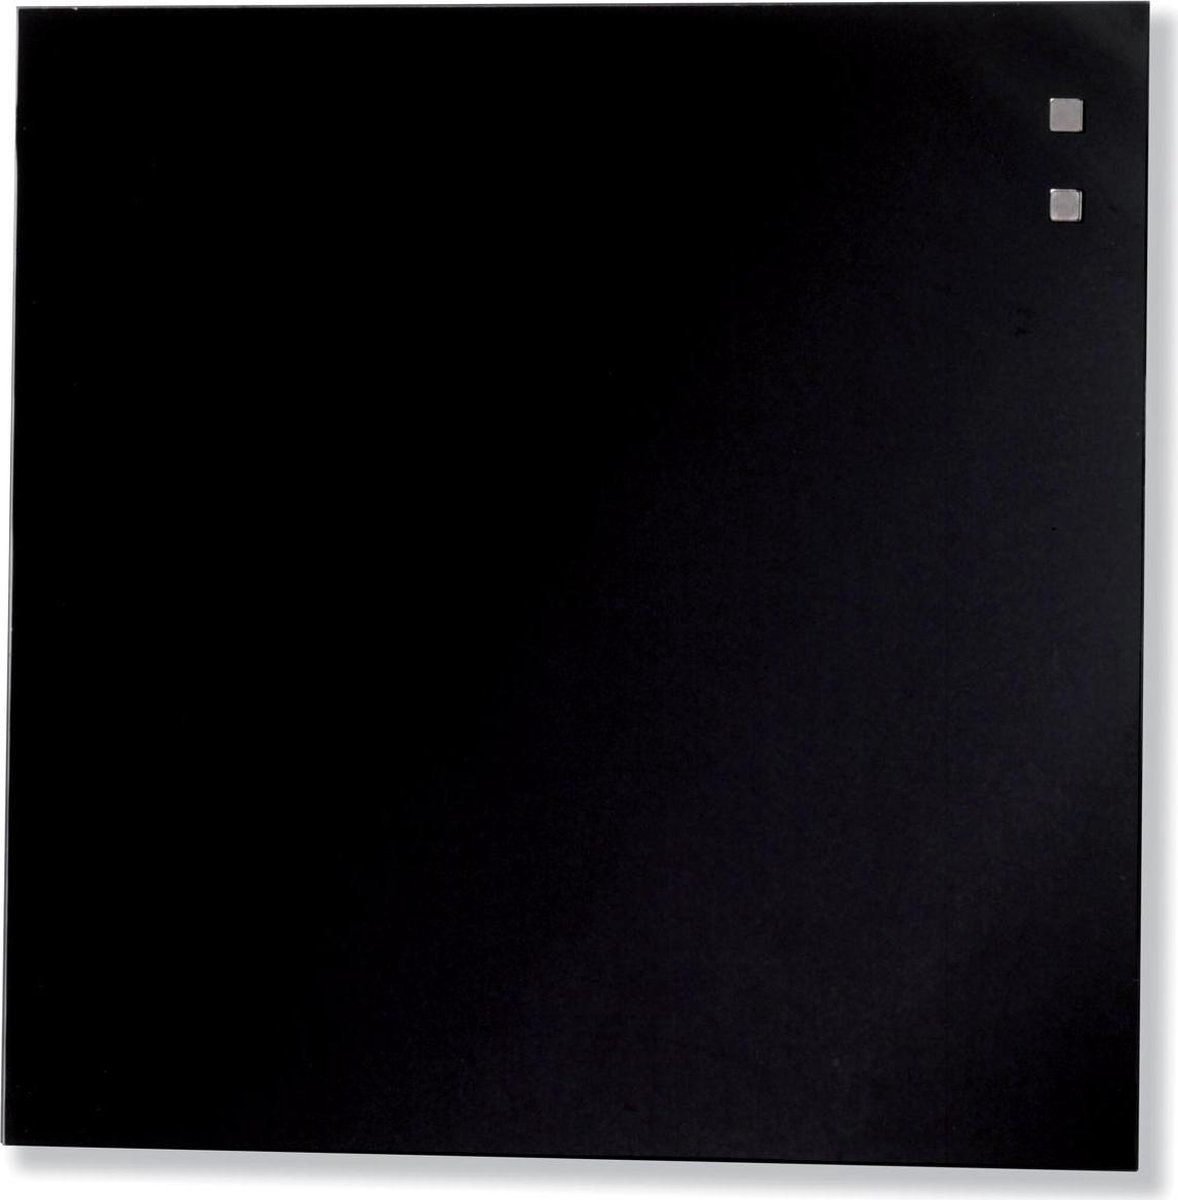 Naga magnetisch glasbord zwart formaat 35 x 35 cm